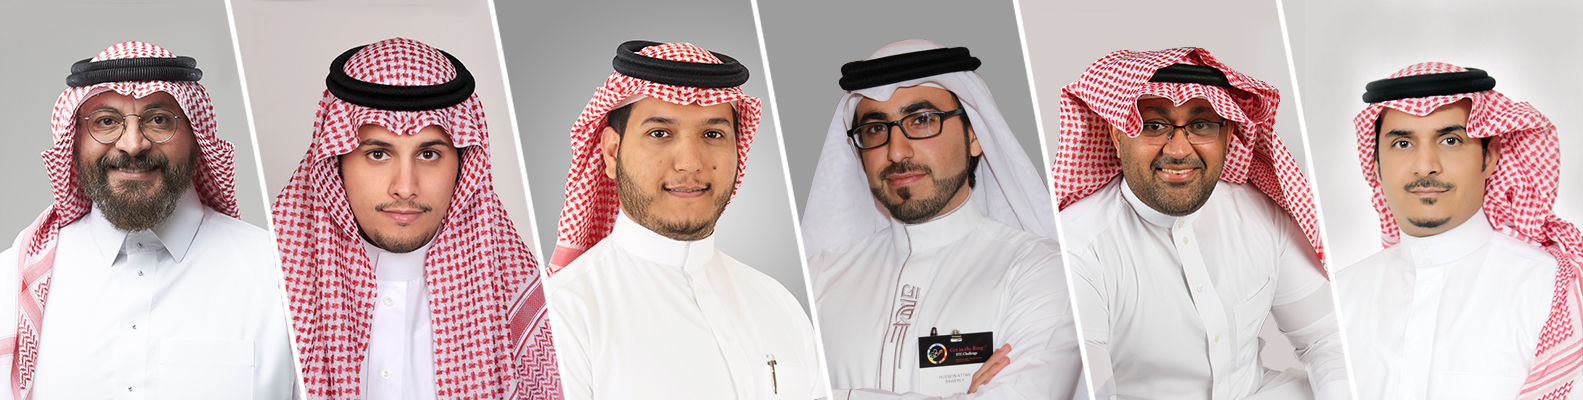 Entrepreneurs Shaping Saudi Arabia's Future